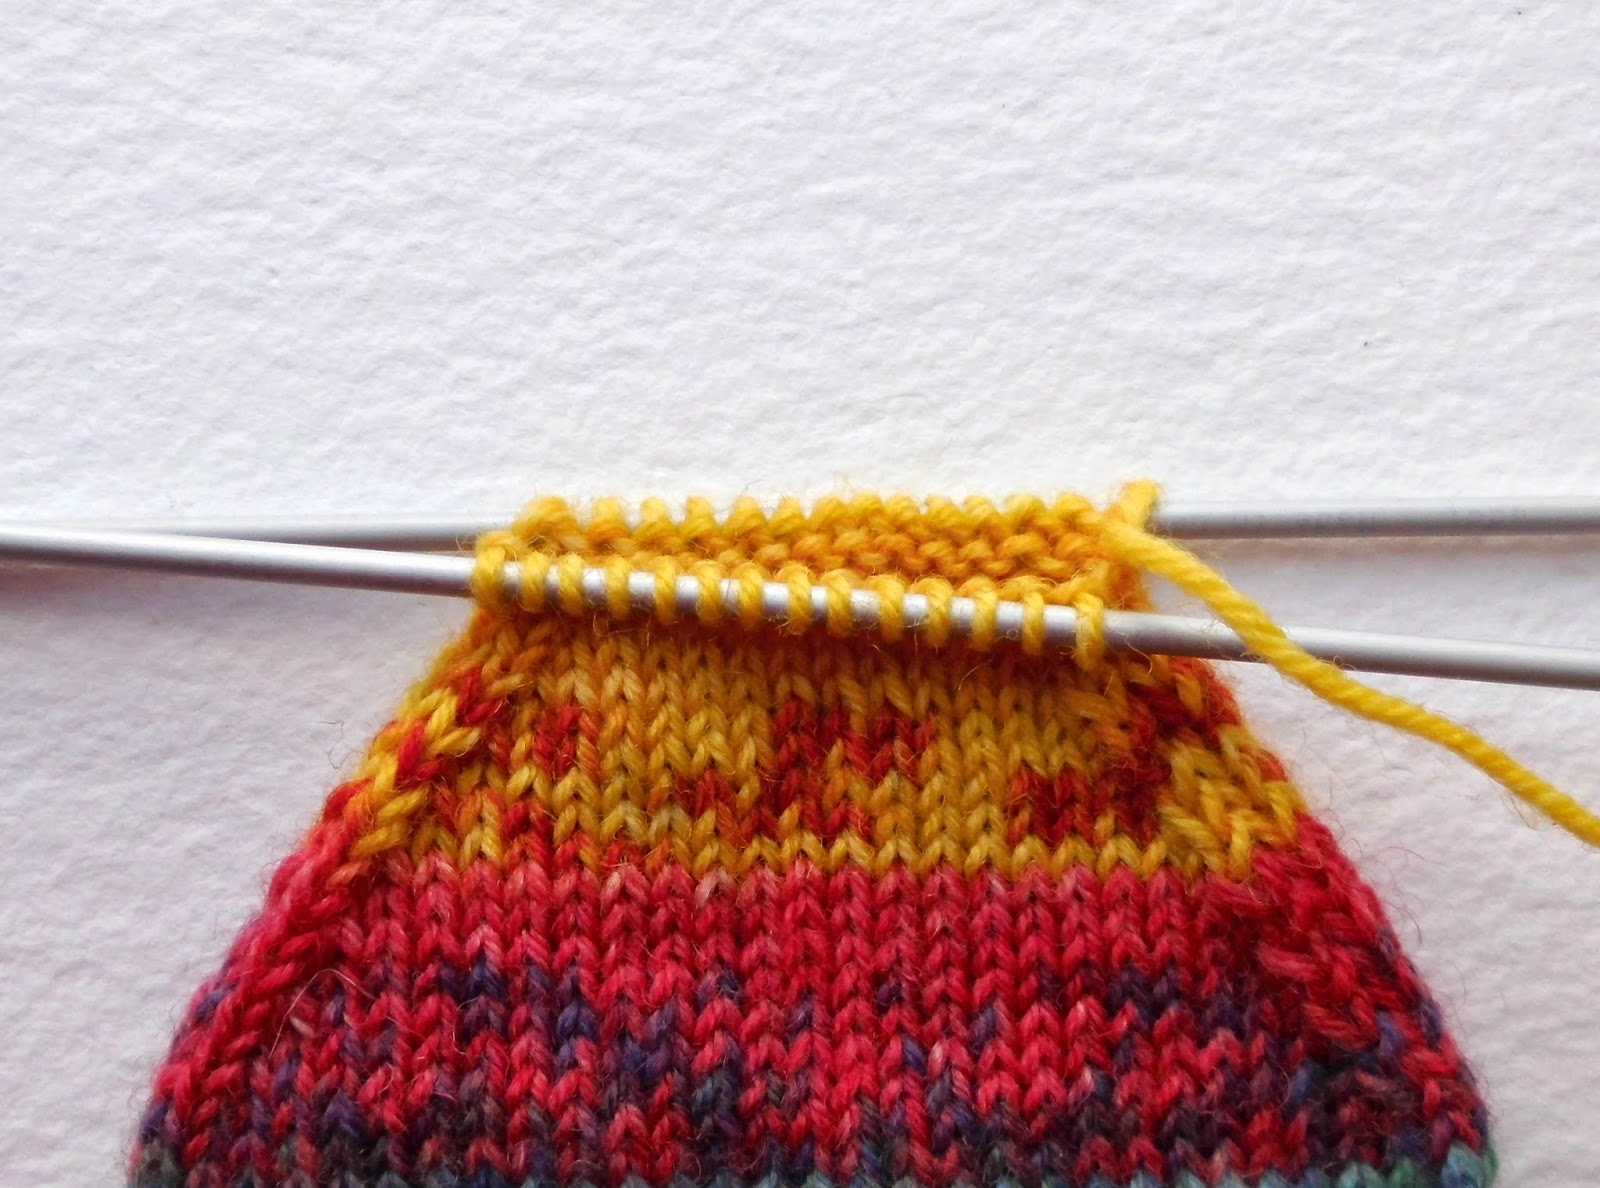 How Do You Graft Knitting Stitches Together : Winwick Mum: Beginner sock knitting: Sockalong - Week 3 - Foot, toe and graft...